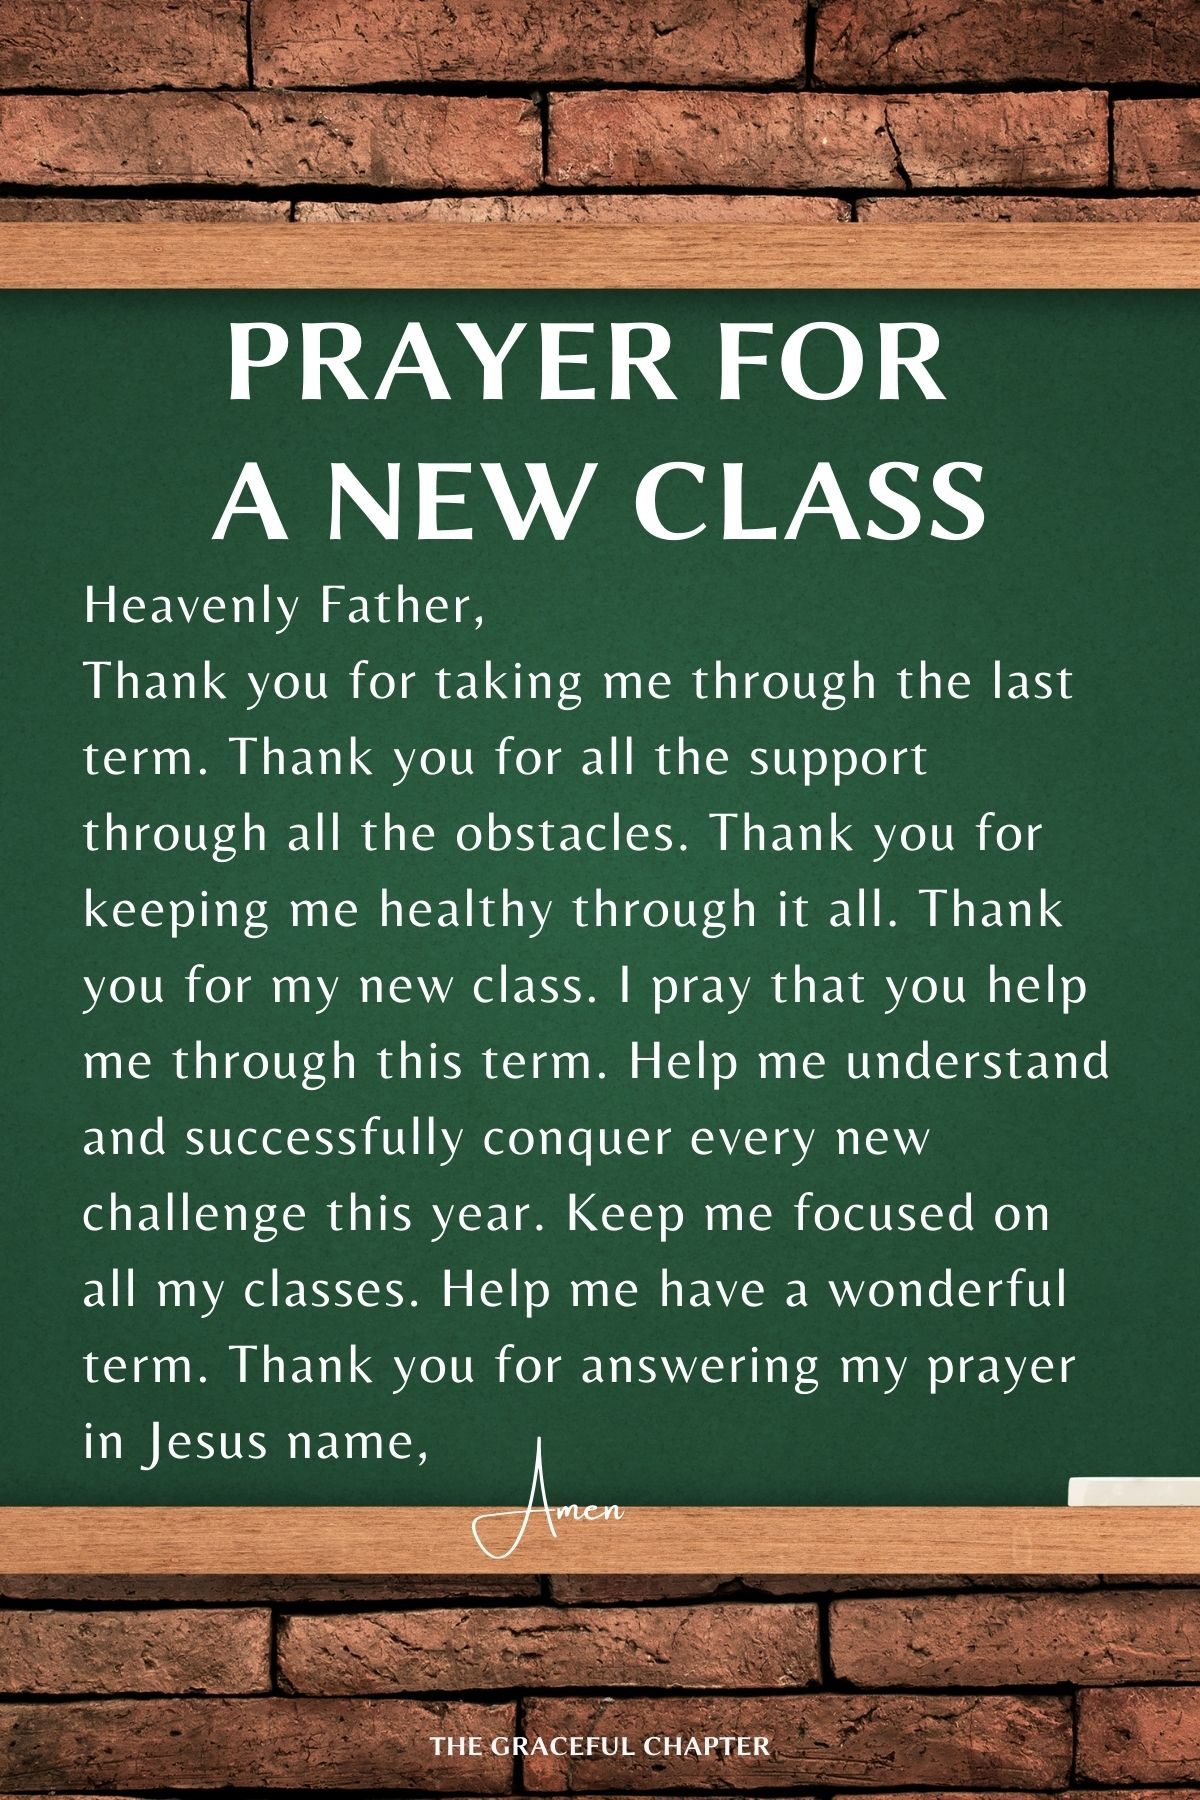 Prayers for school - Prayer for a new class